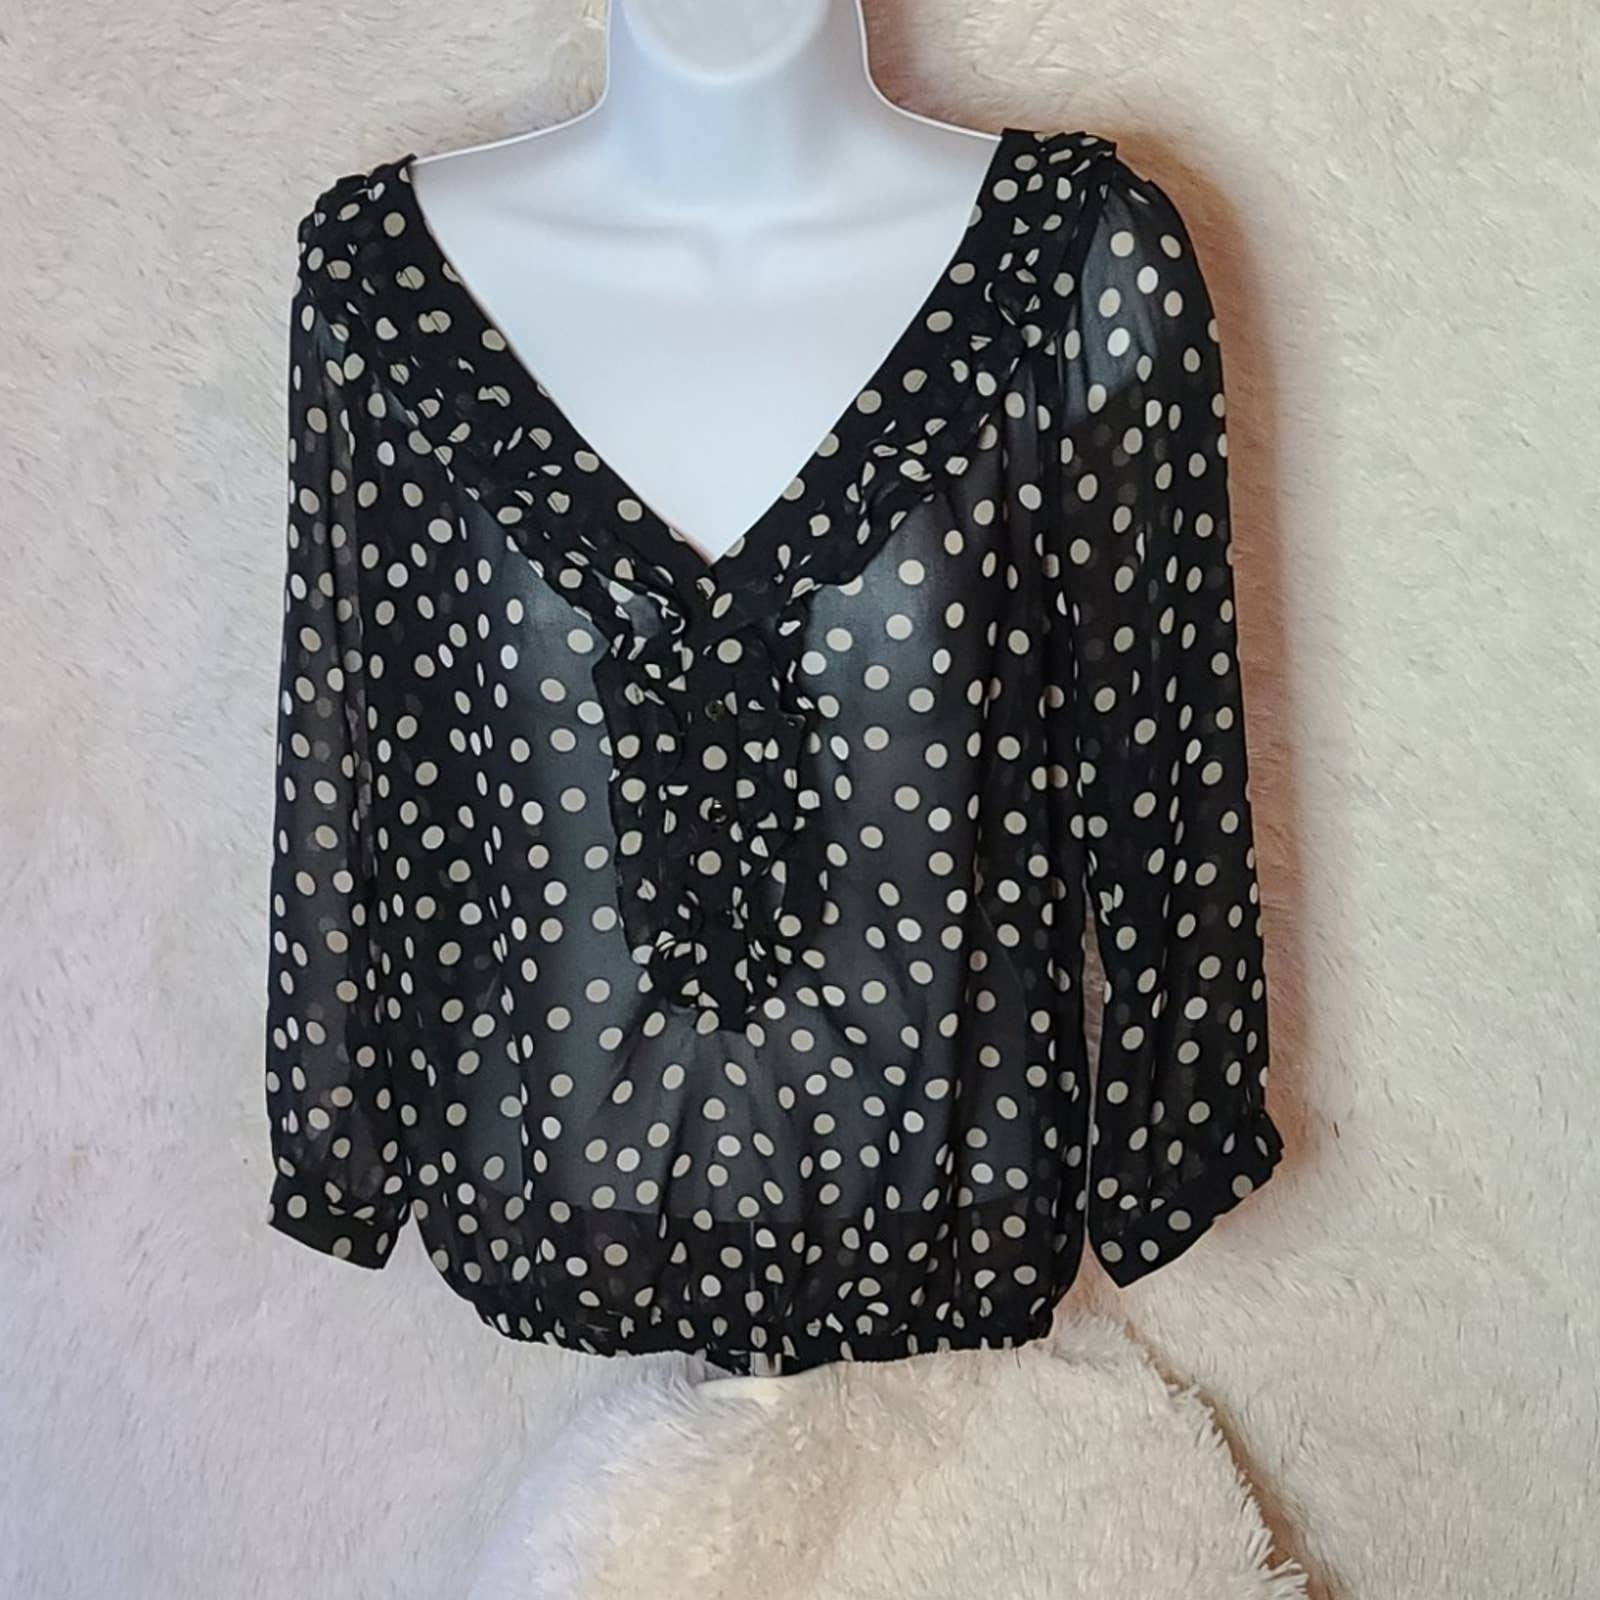 Zara Sheer Polka Dot Top Large